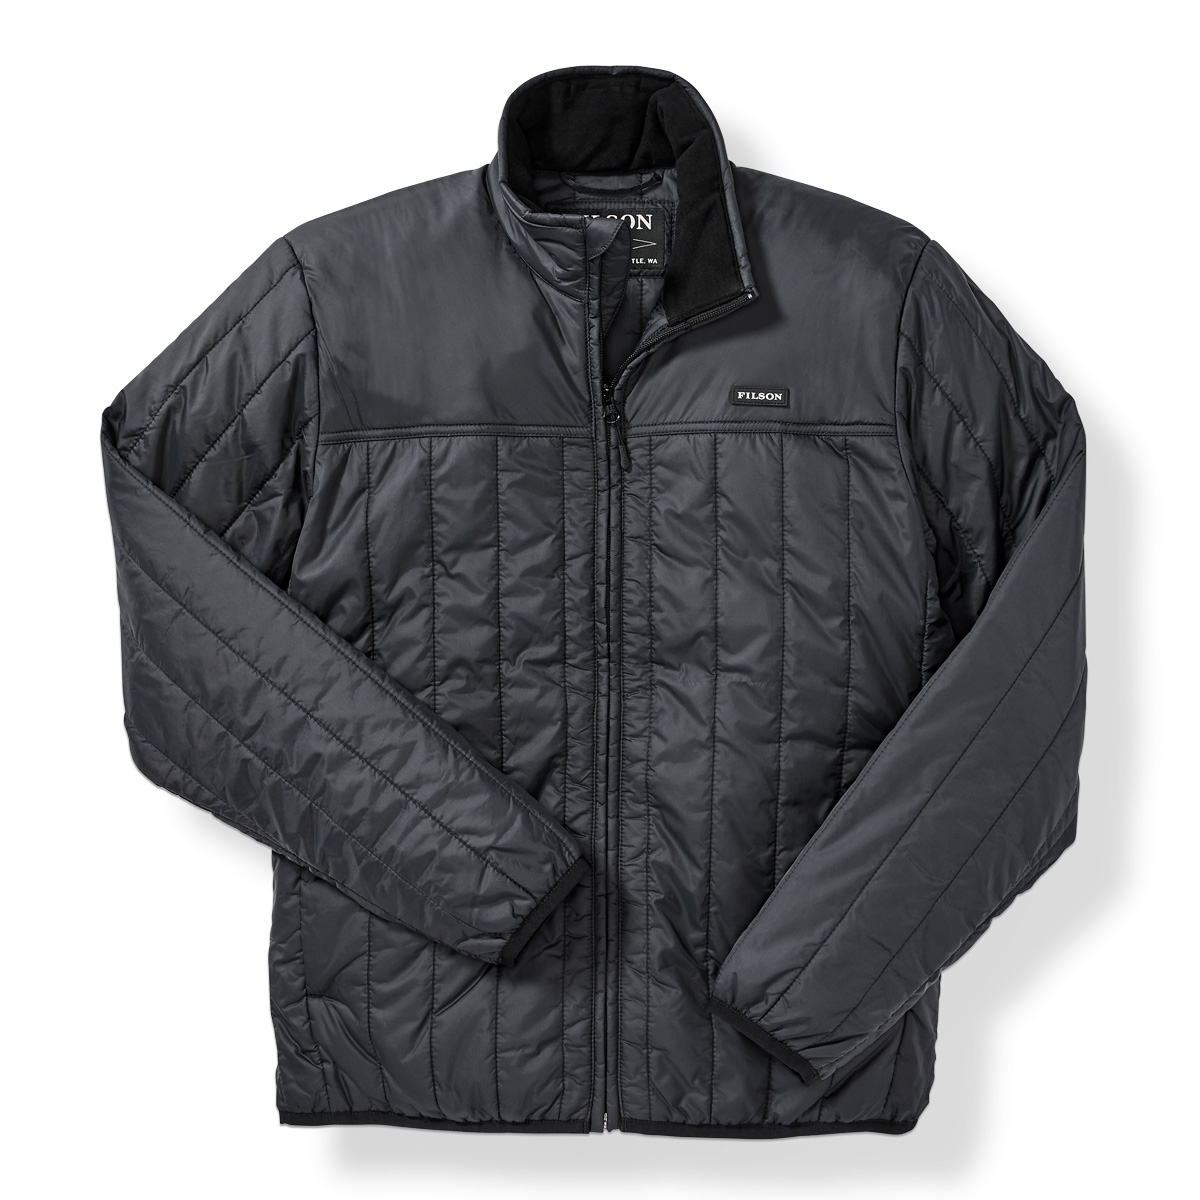 Filson Ultralight Jacket Black